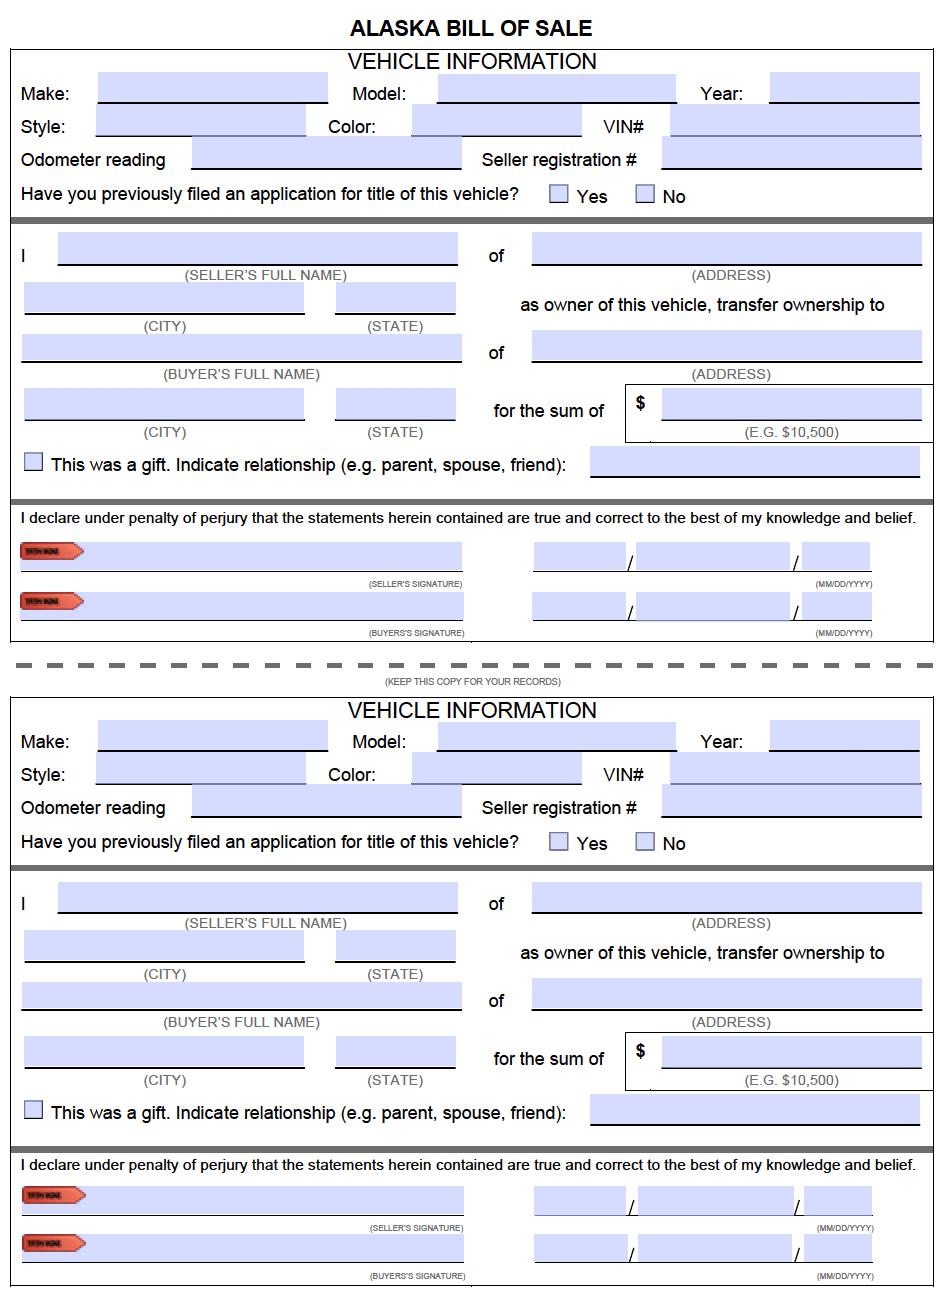 Motor Vehicle Bill Of Sale >> Free Alaska Bill of Sale Forms | PDF